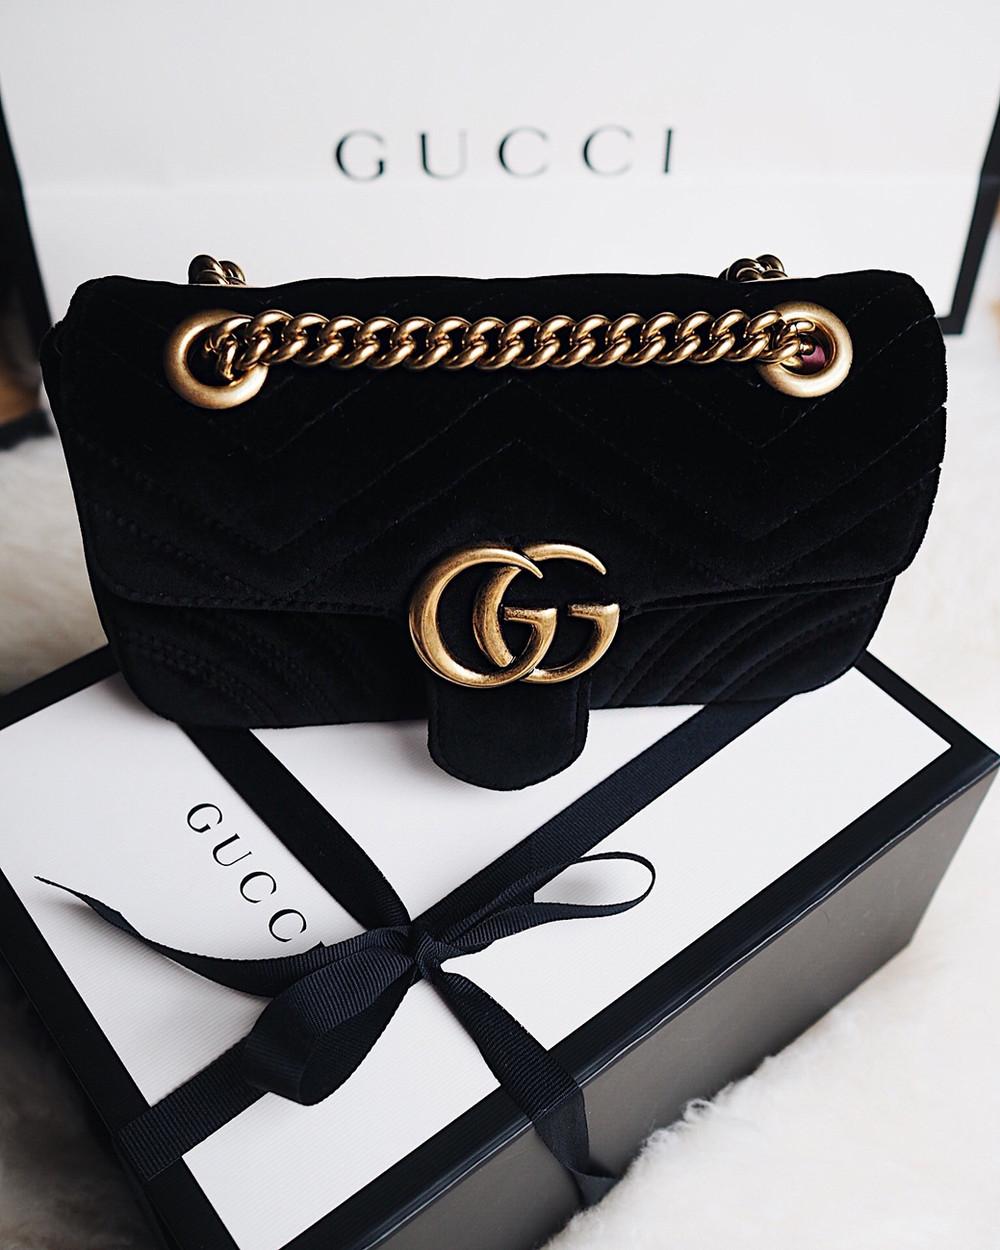 Gucci- My First Designer Bag